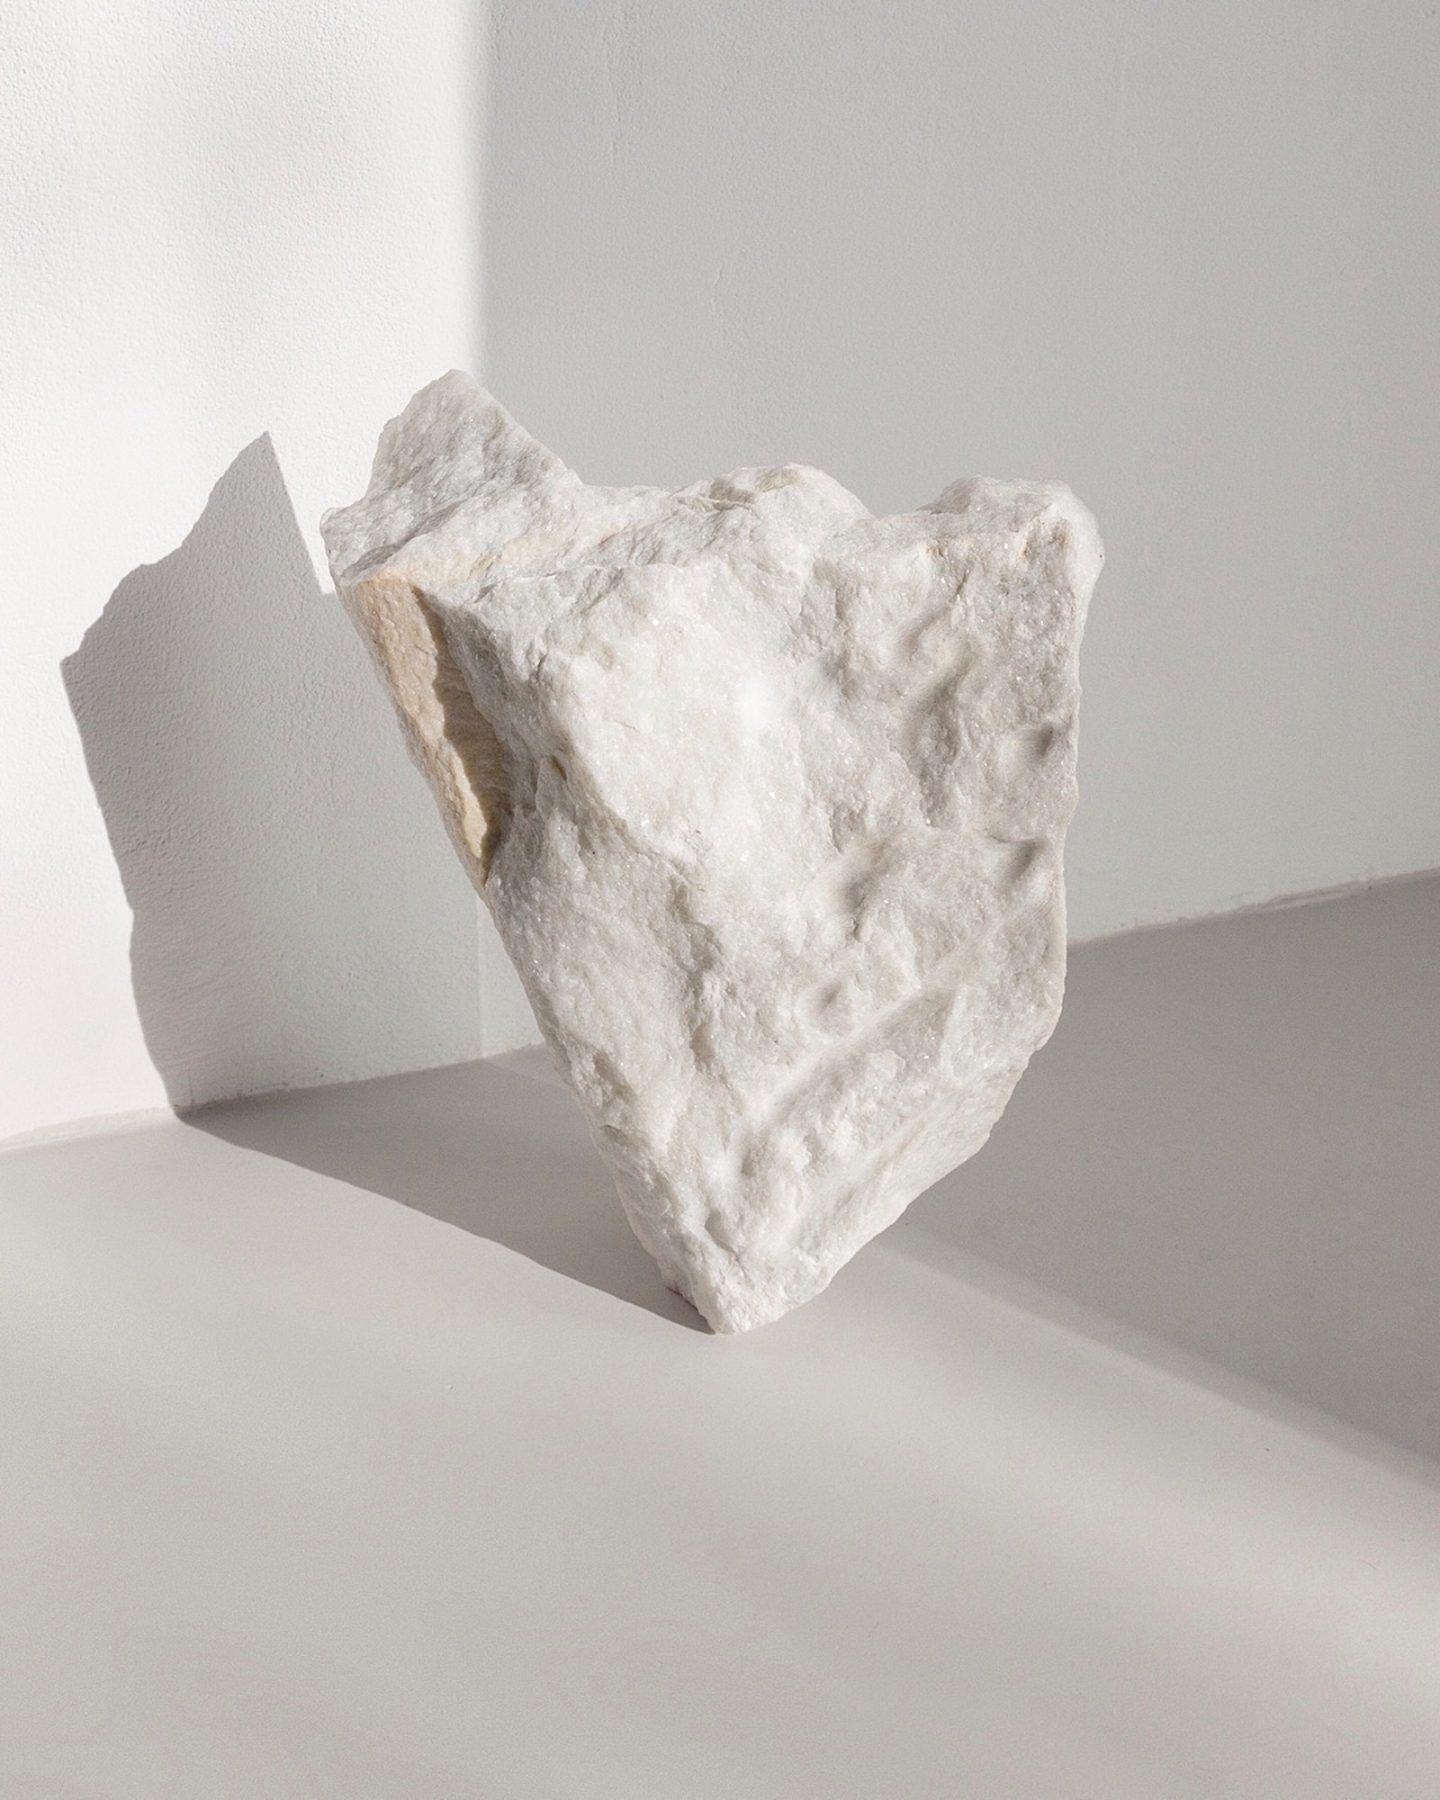 IGNANT-Design-Carla-Cascales-Alimbau-005